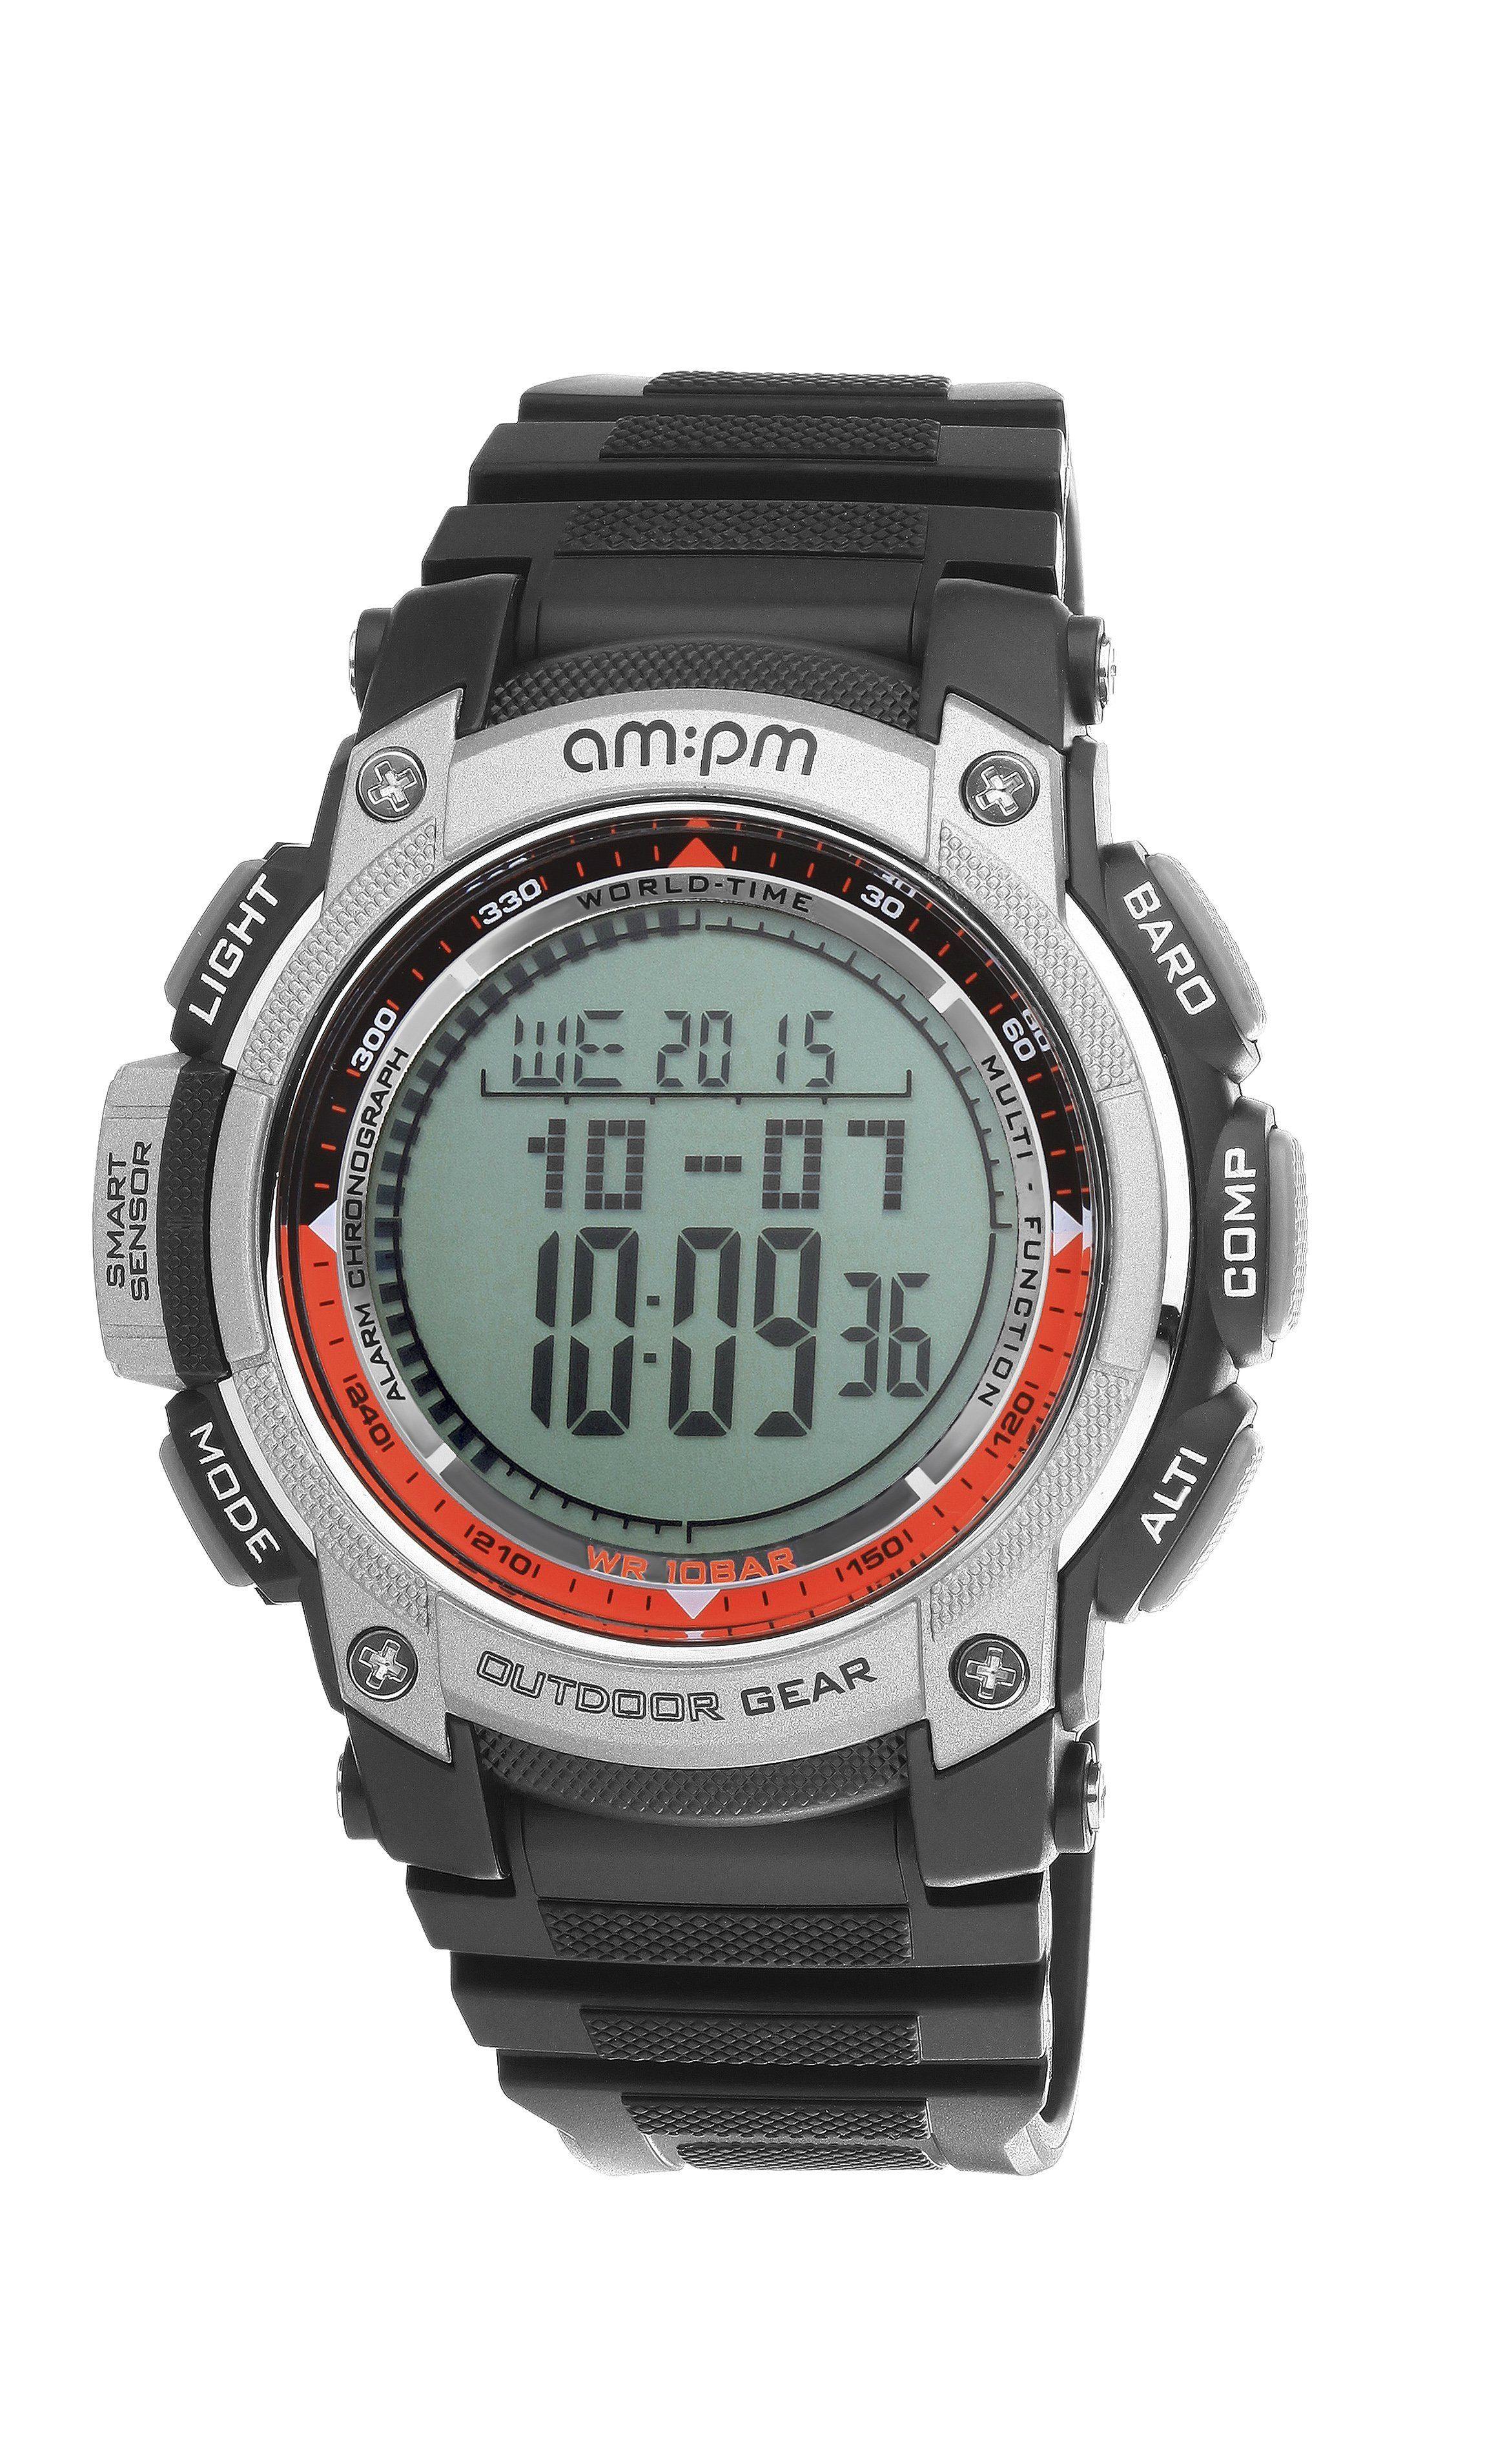 AM PM PC167-G406 Men s Outdoor Gear Digital Sports Watch Barometer ... 2610b5279